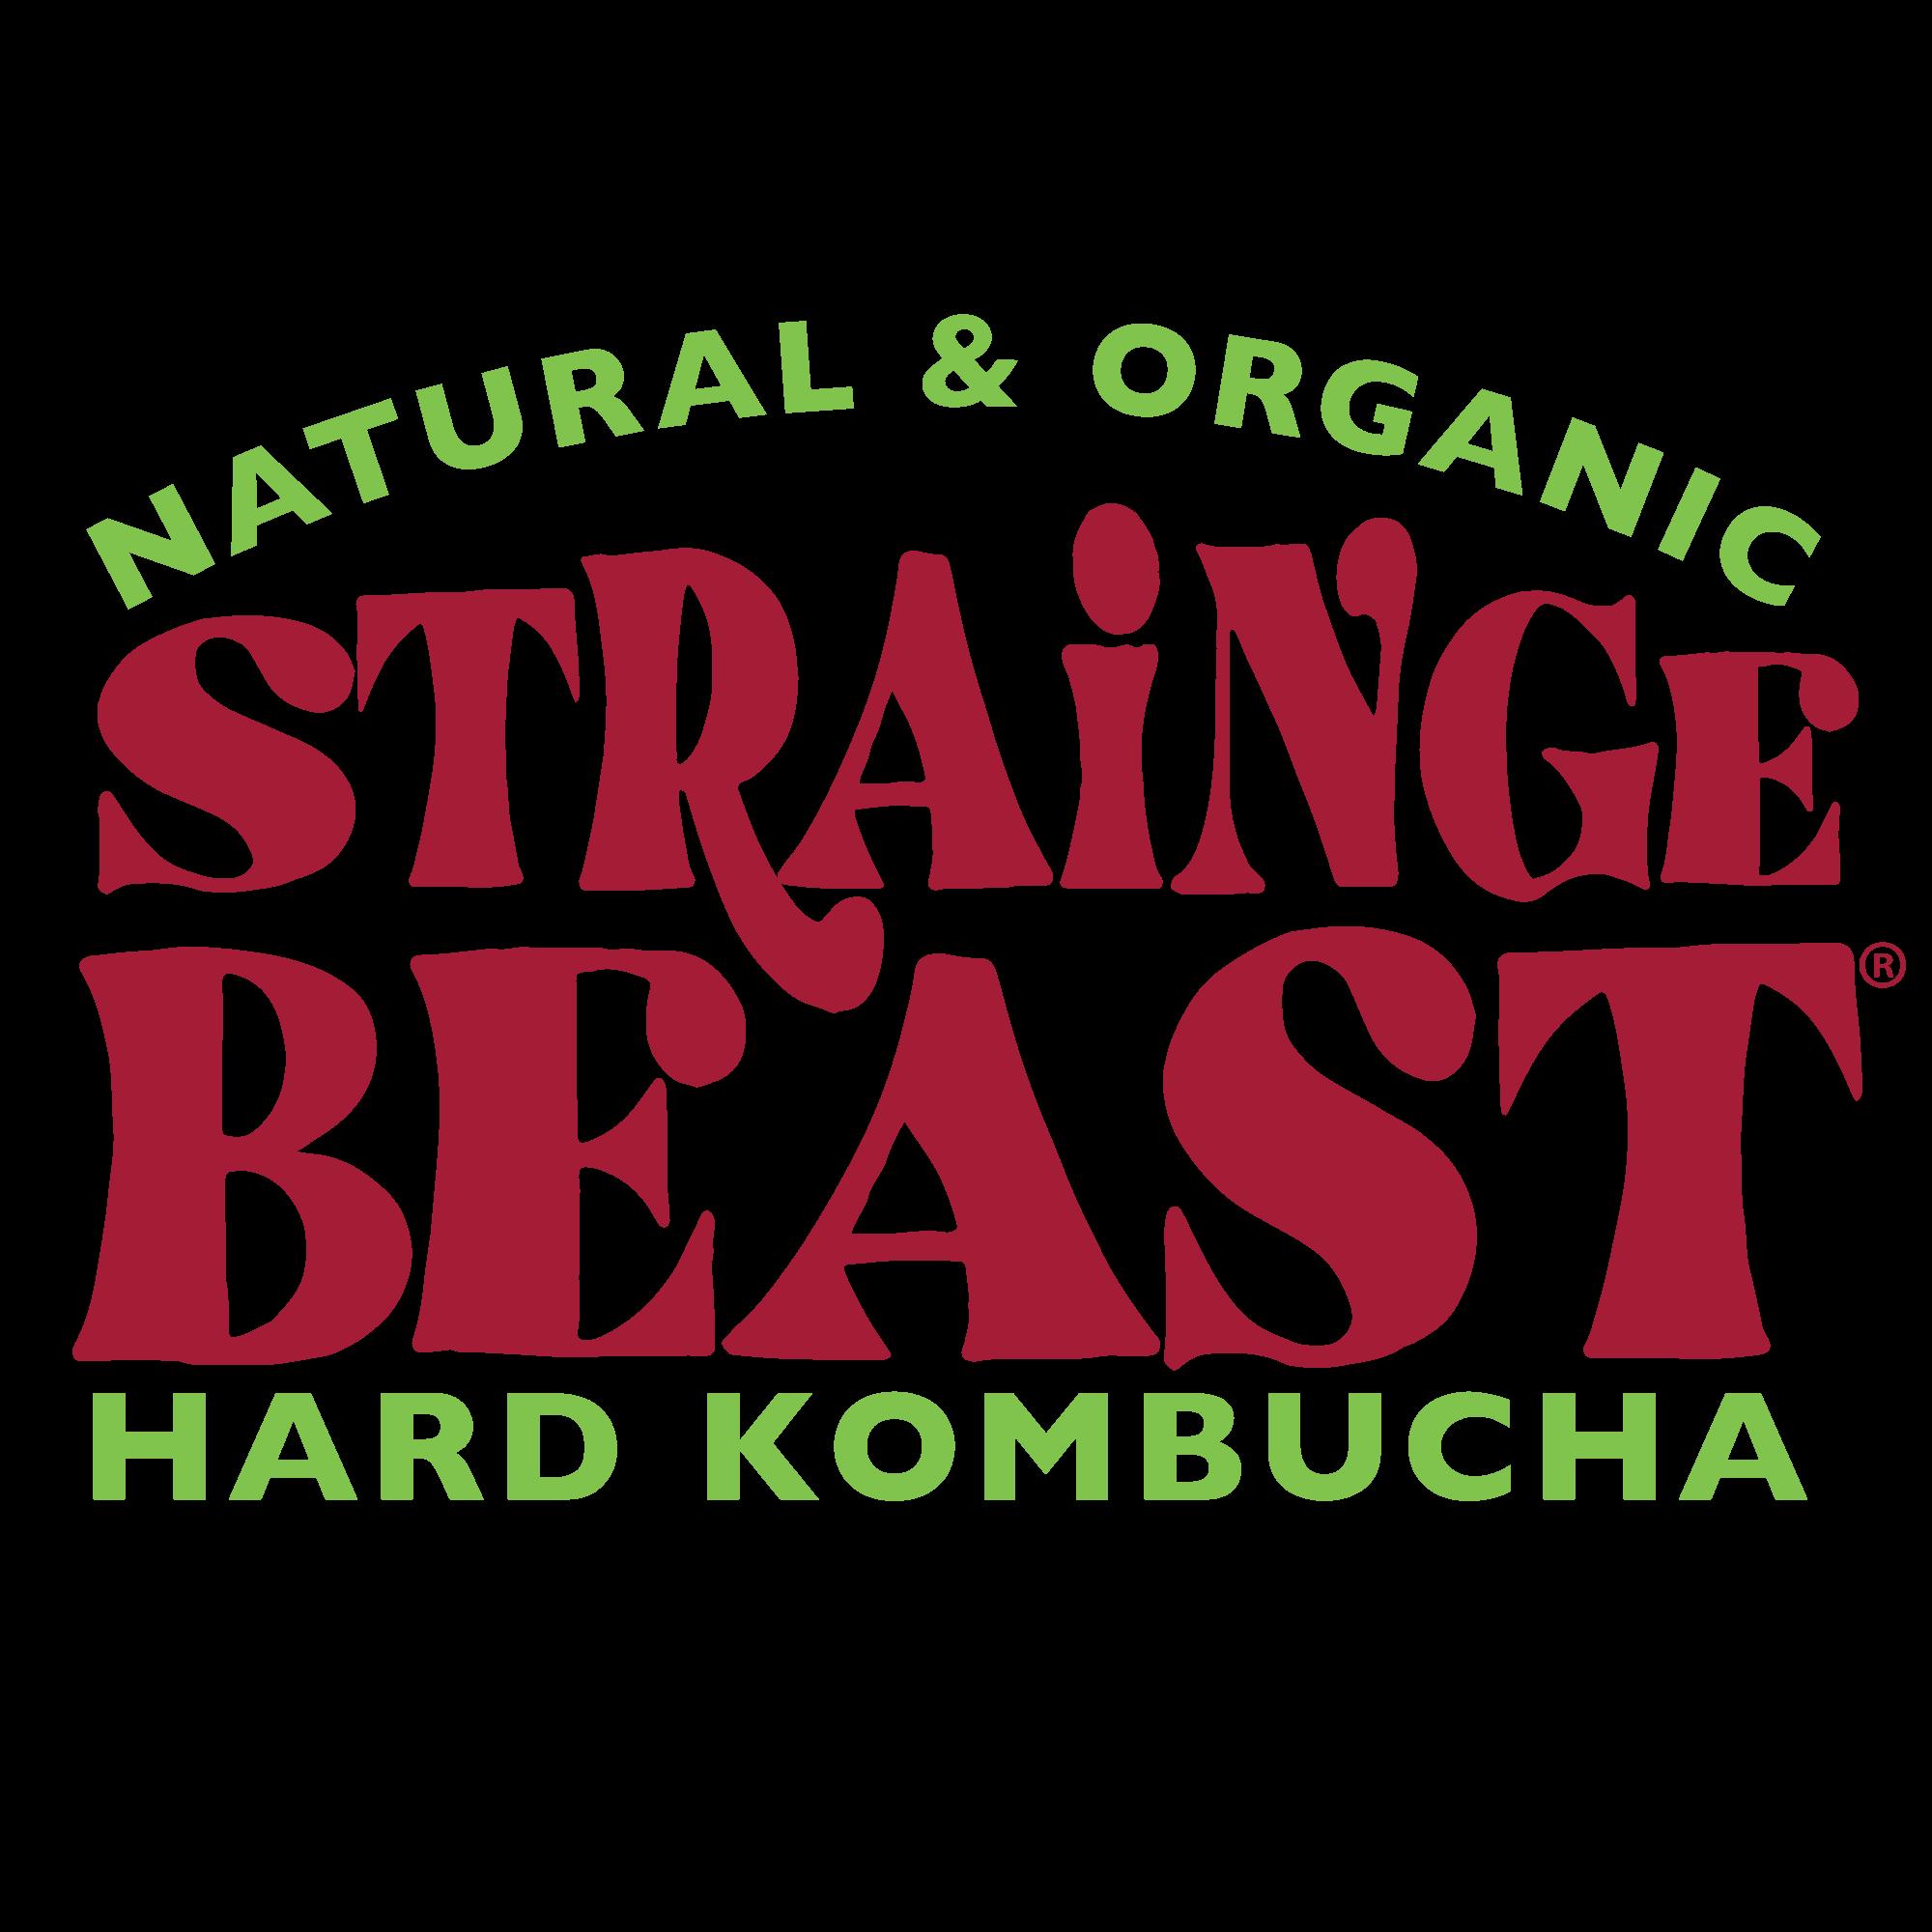 Strainge Beast Kombucha